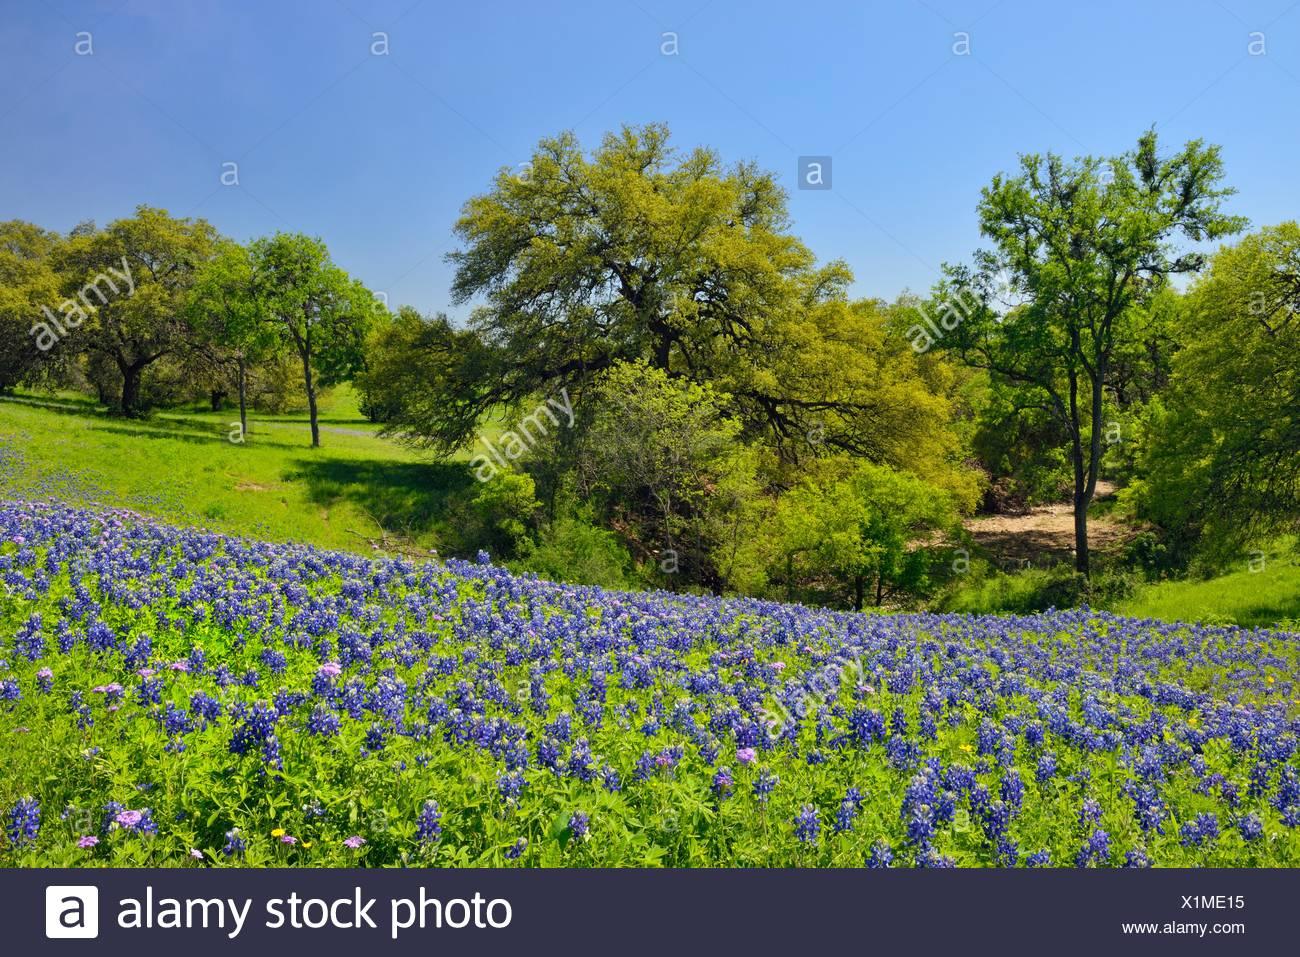 Bluebonnet New Braunfels >> Roadside Texas Bluebonnets New Braunfels Texas Usa Stock Photo